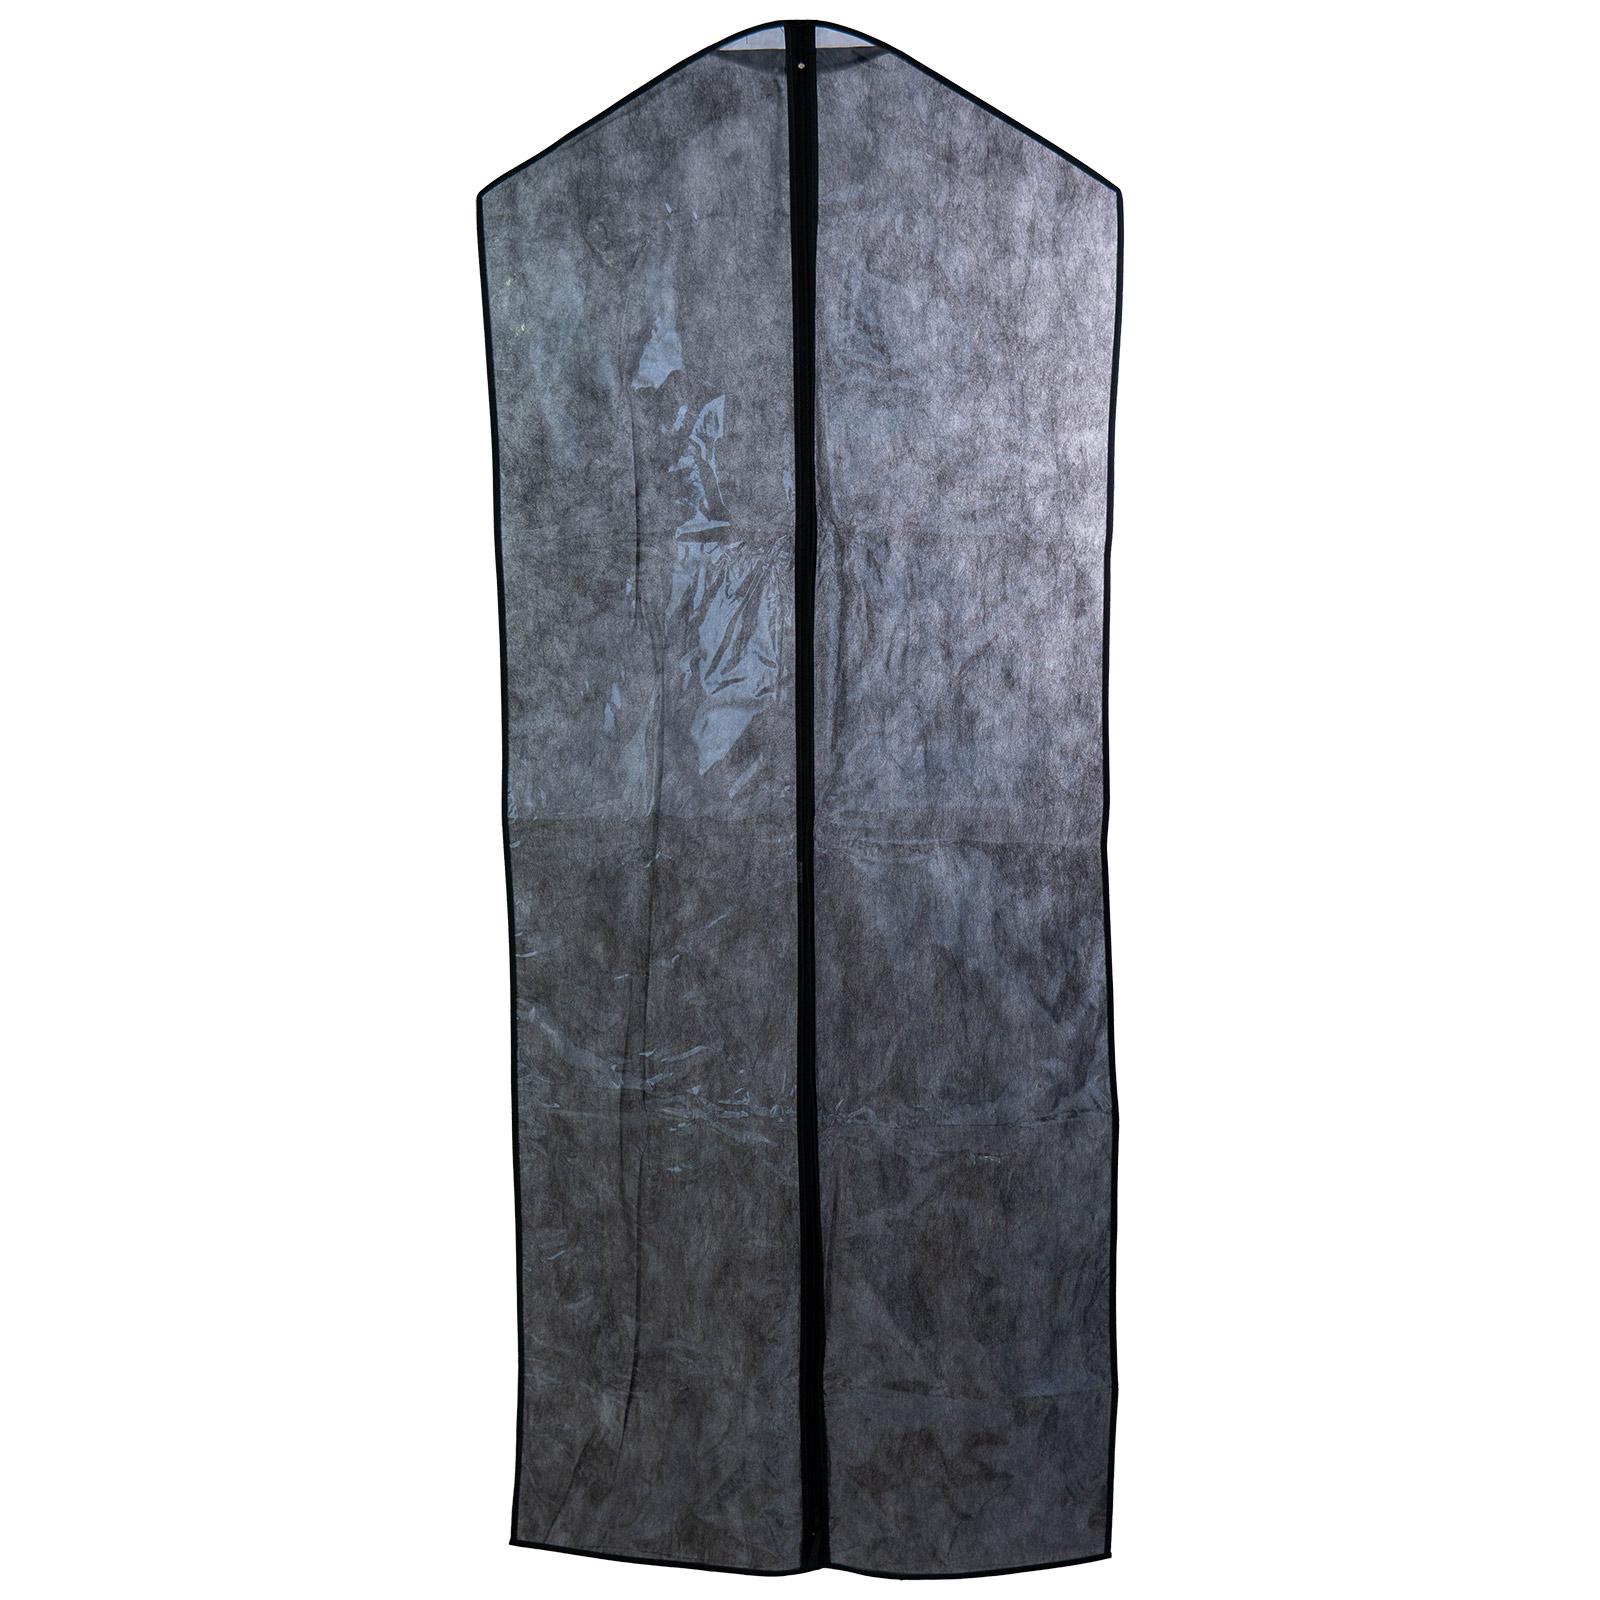 Kit Capa Vestido Zíper Preto - 10 Unidades